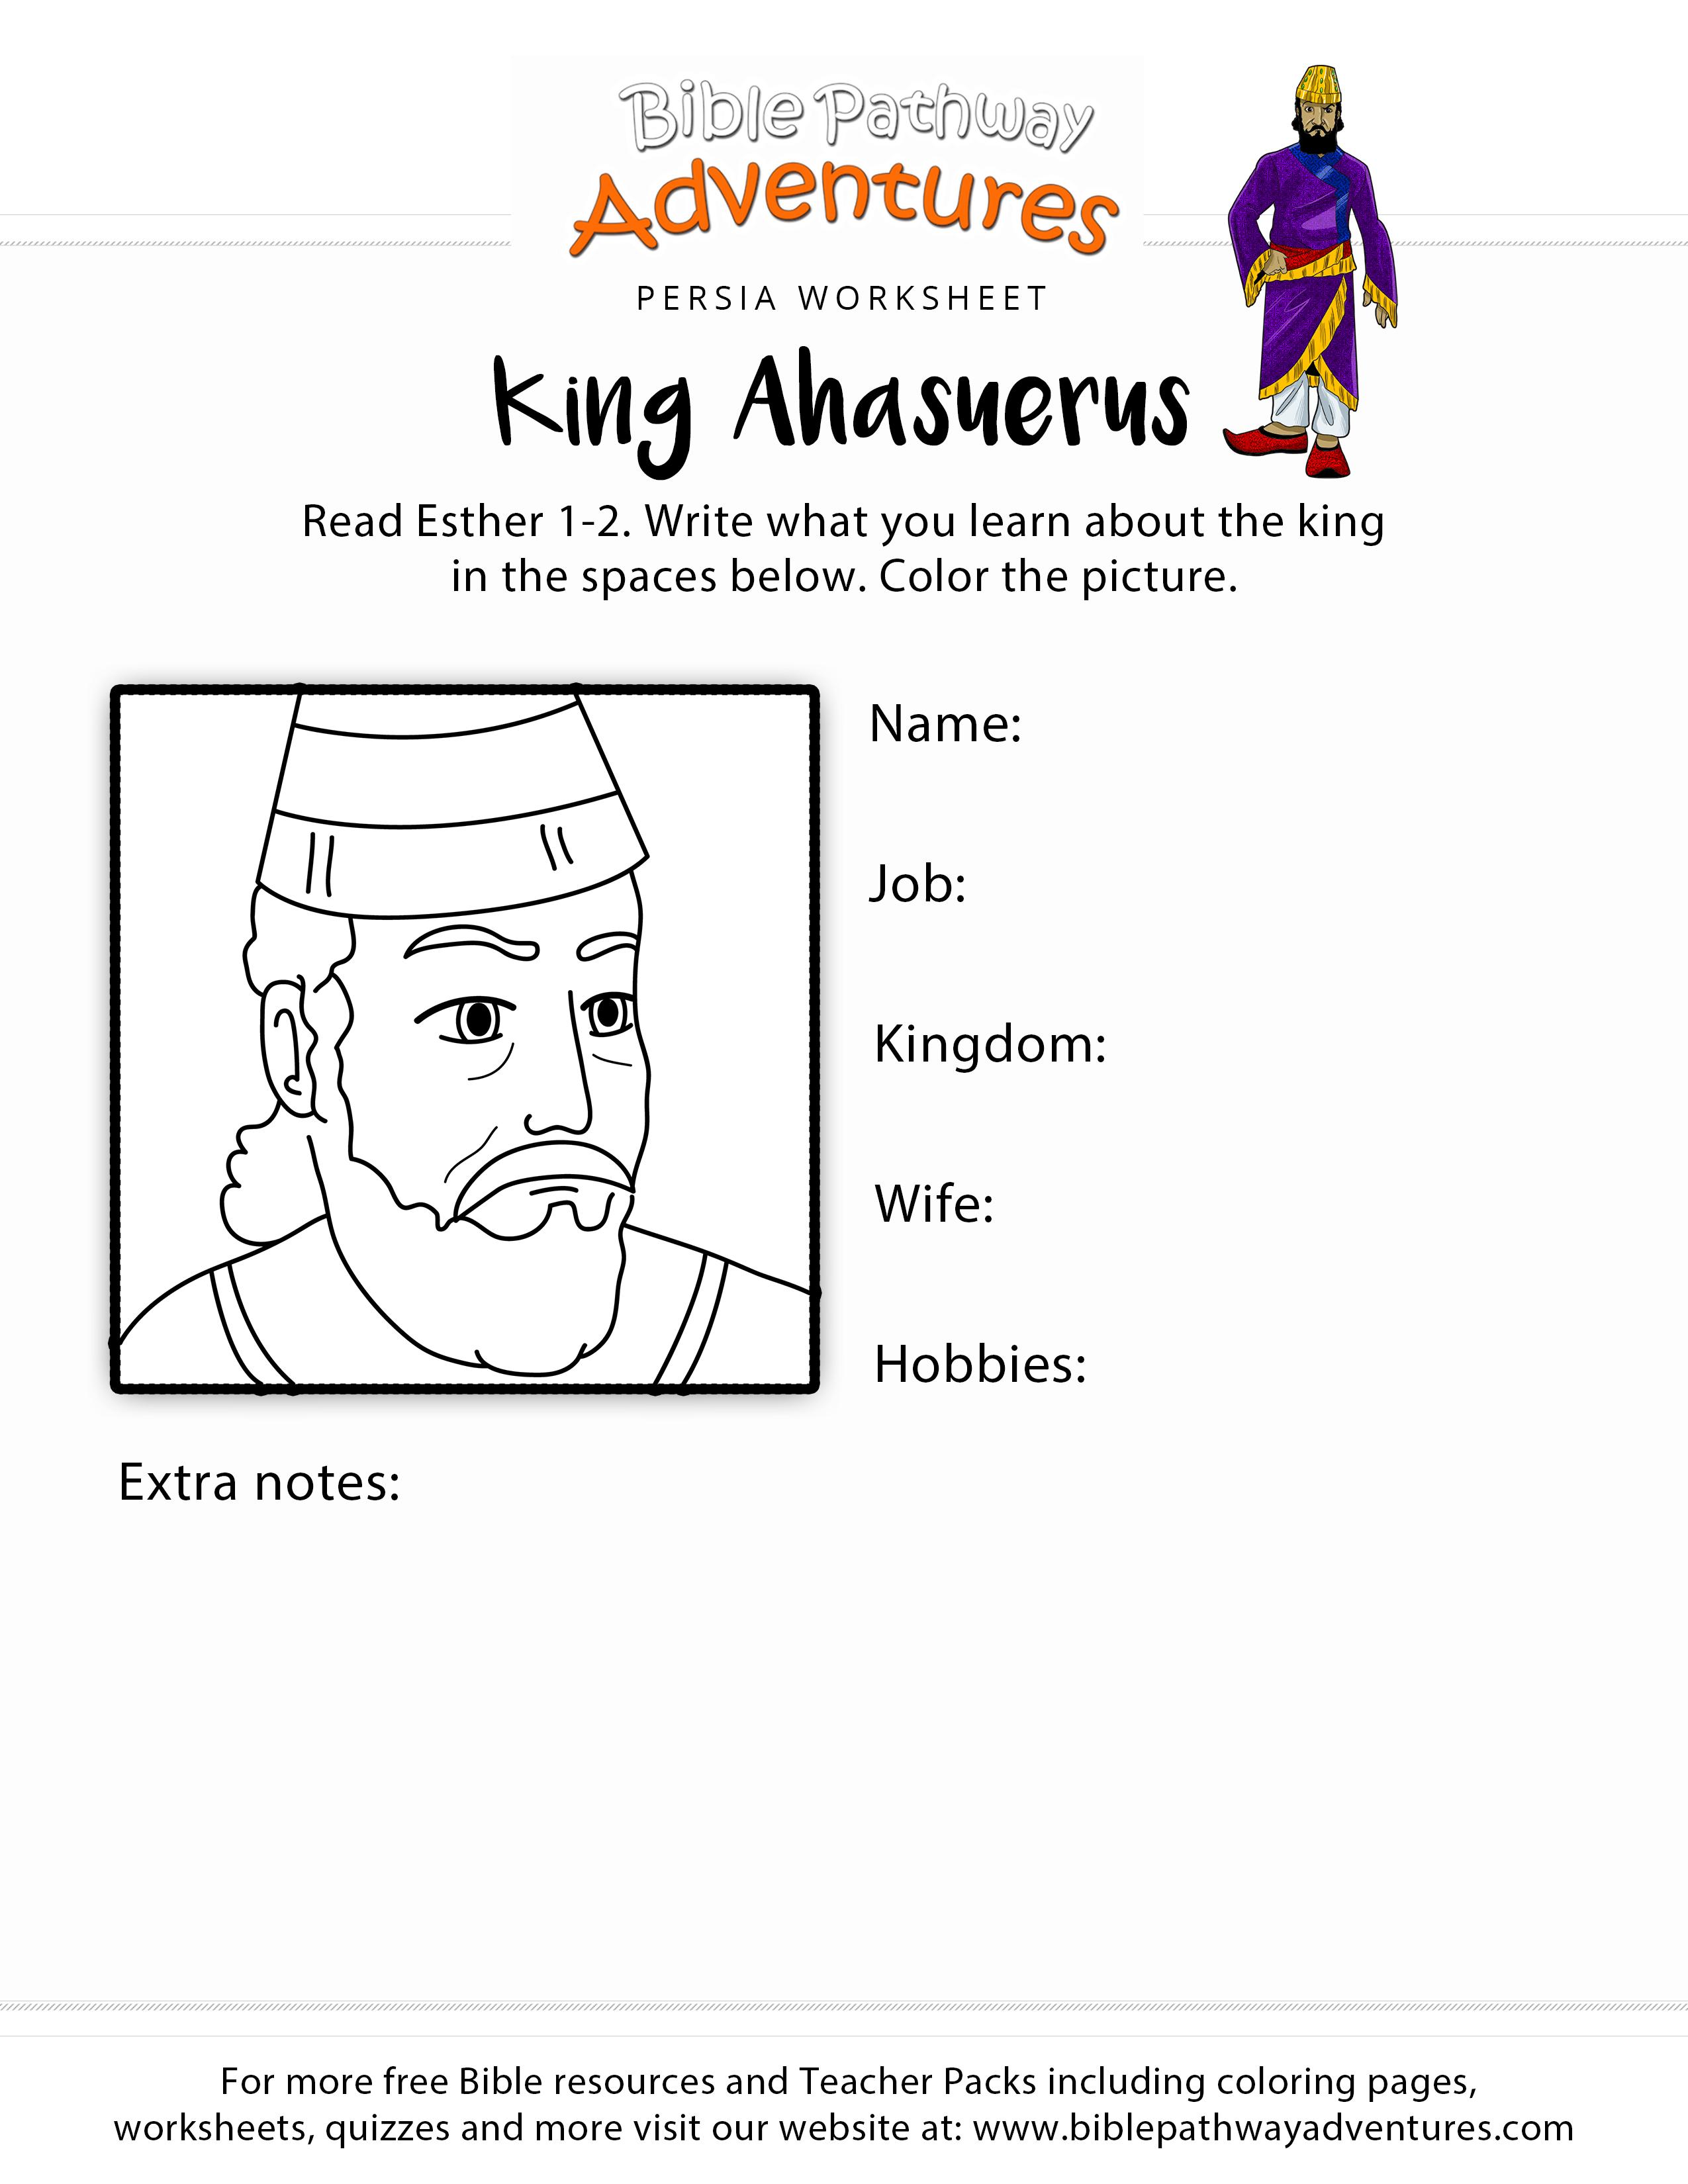 King Ahasuerus Worksheet For Kids